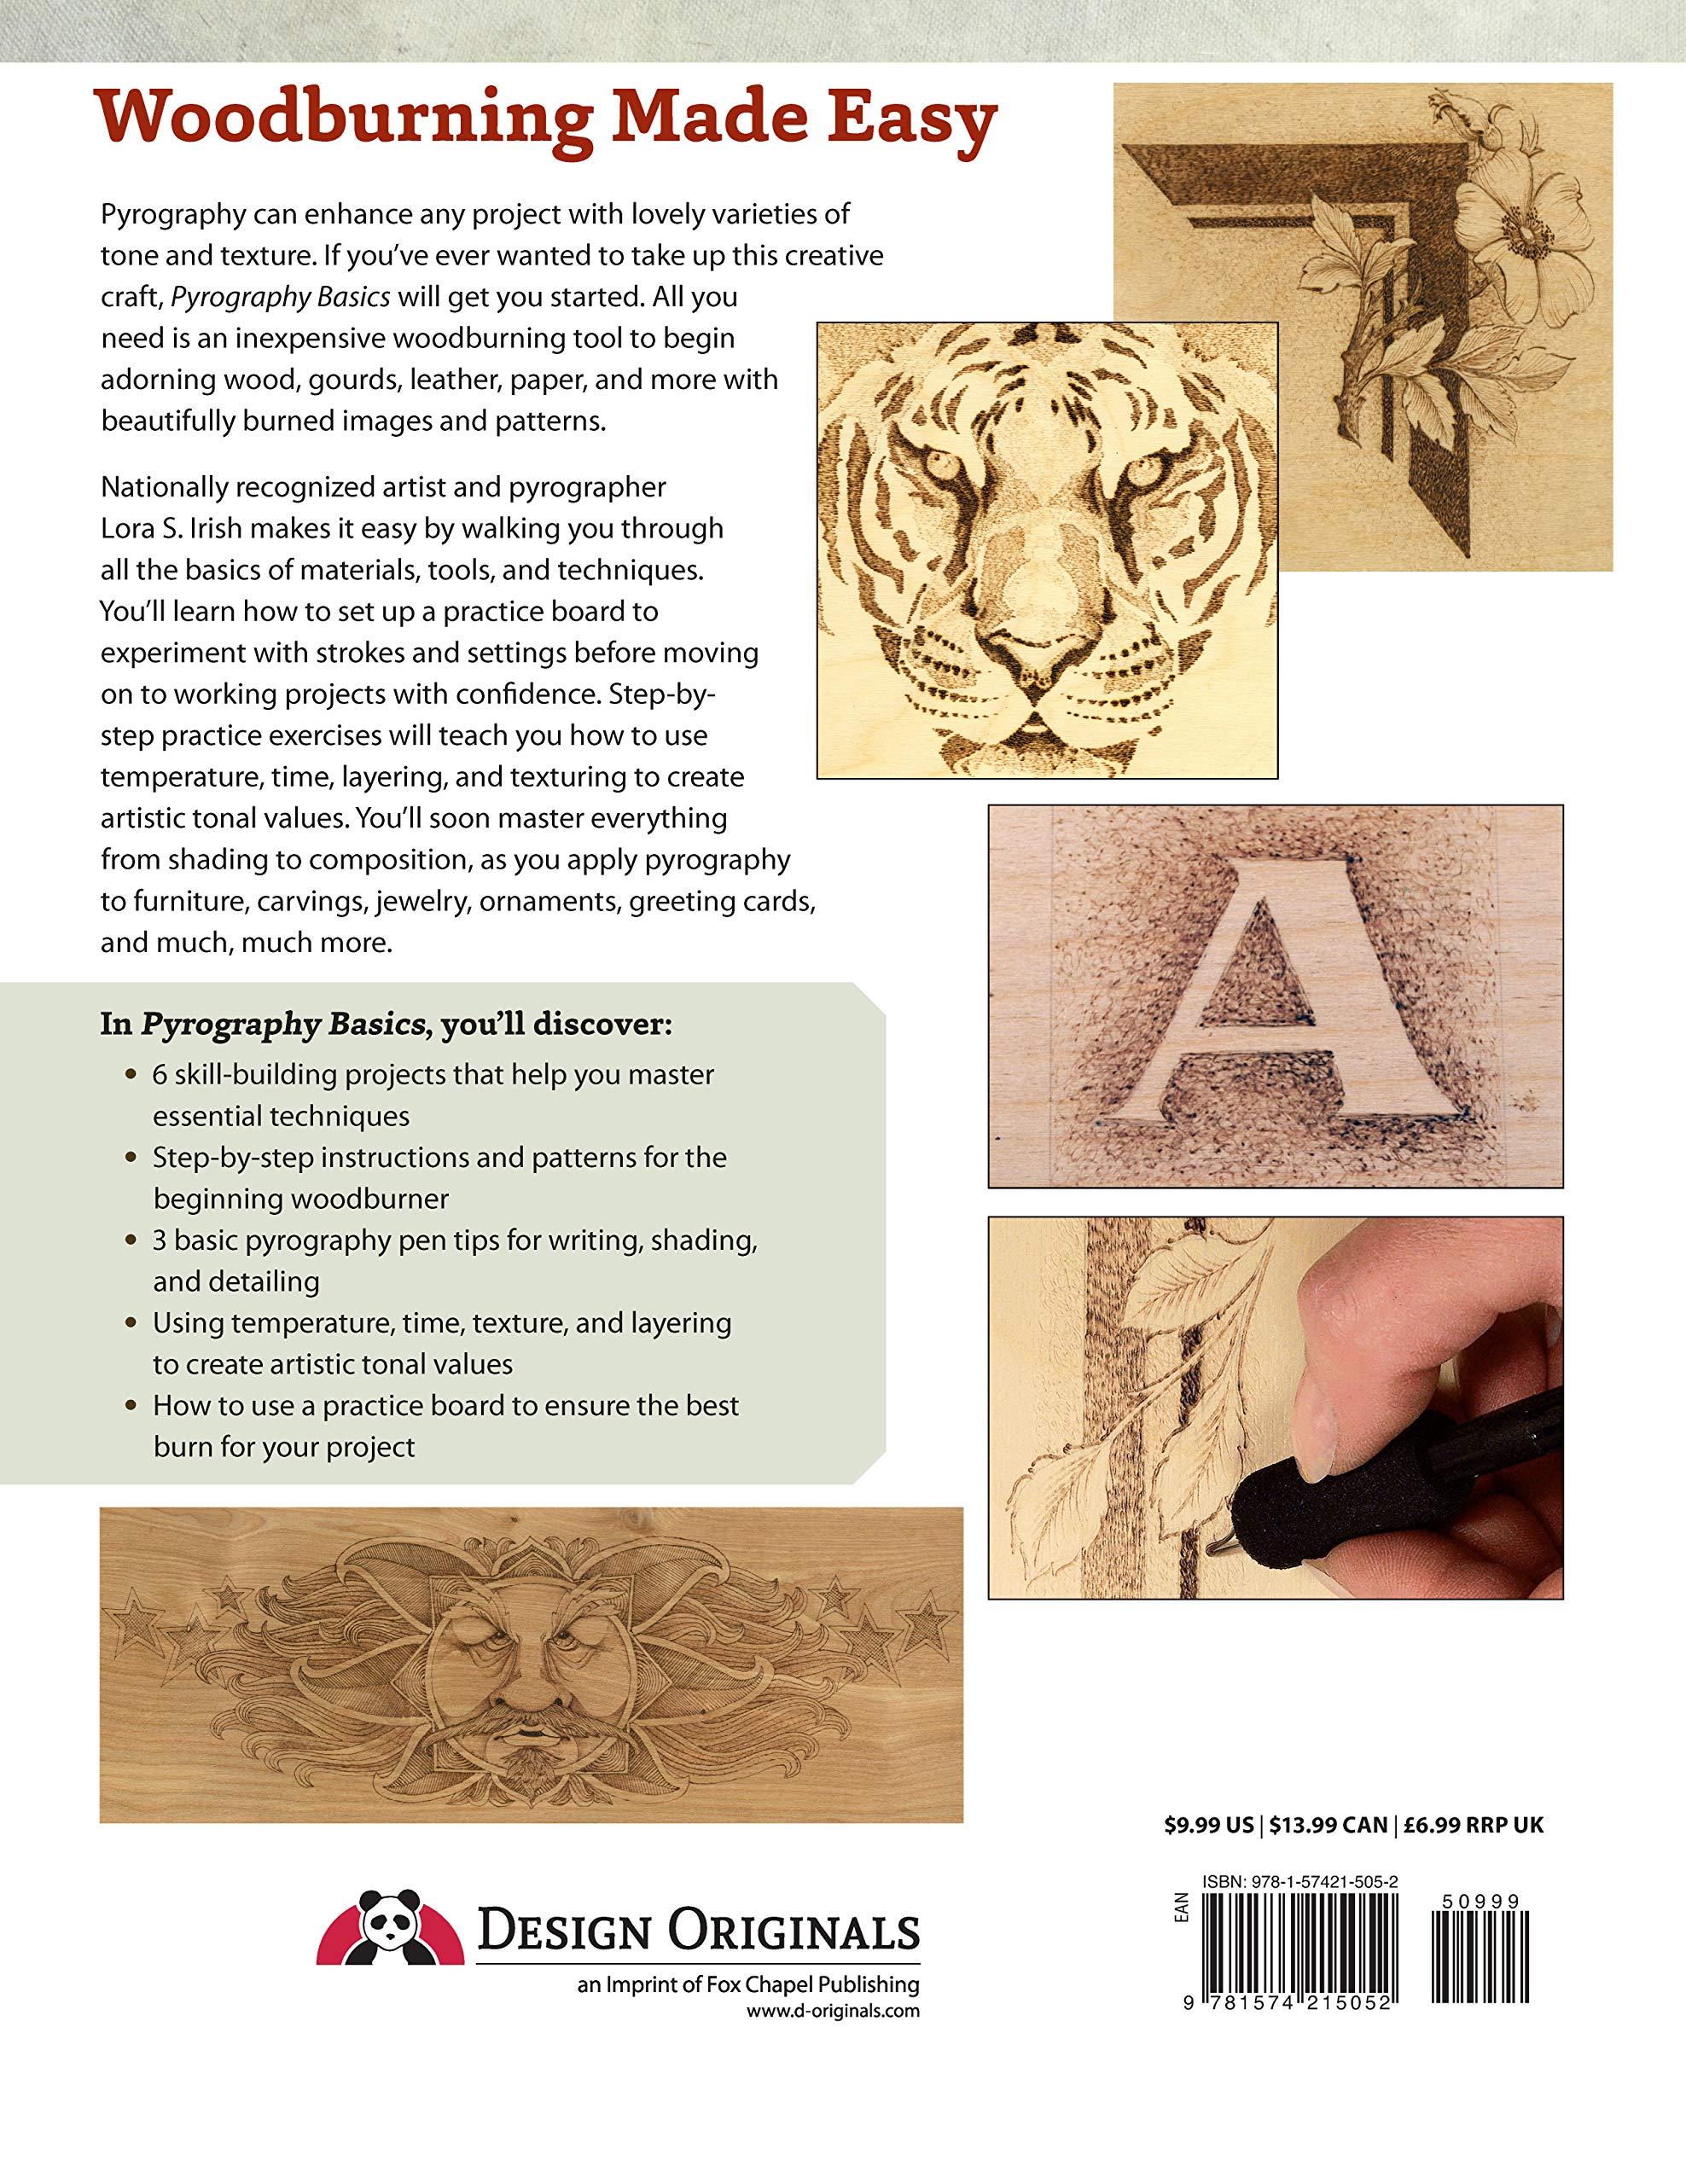 Pyrography Basics: Techniques and Exercises for Beginners: Amazon.es: Lora S. Irish: Libros en idiomas extranjeros